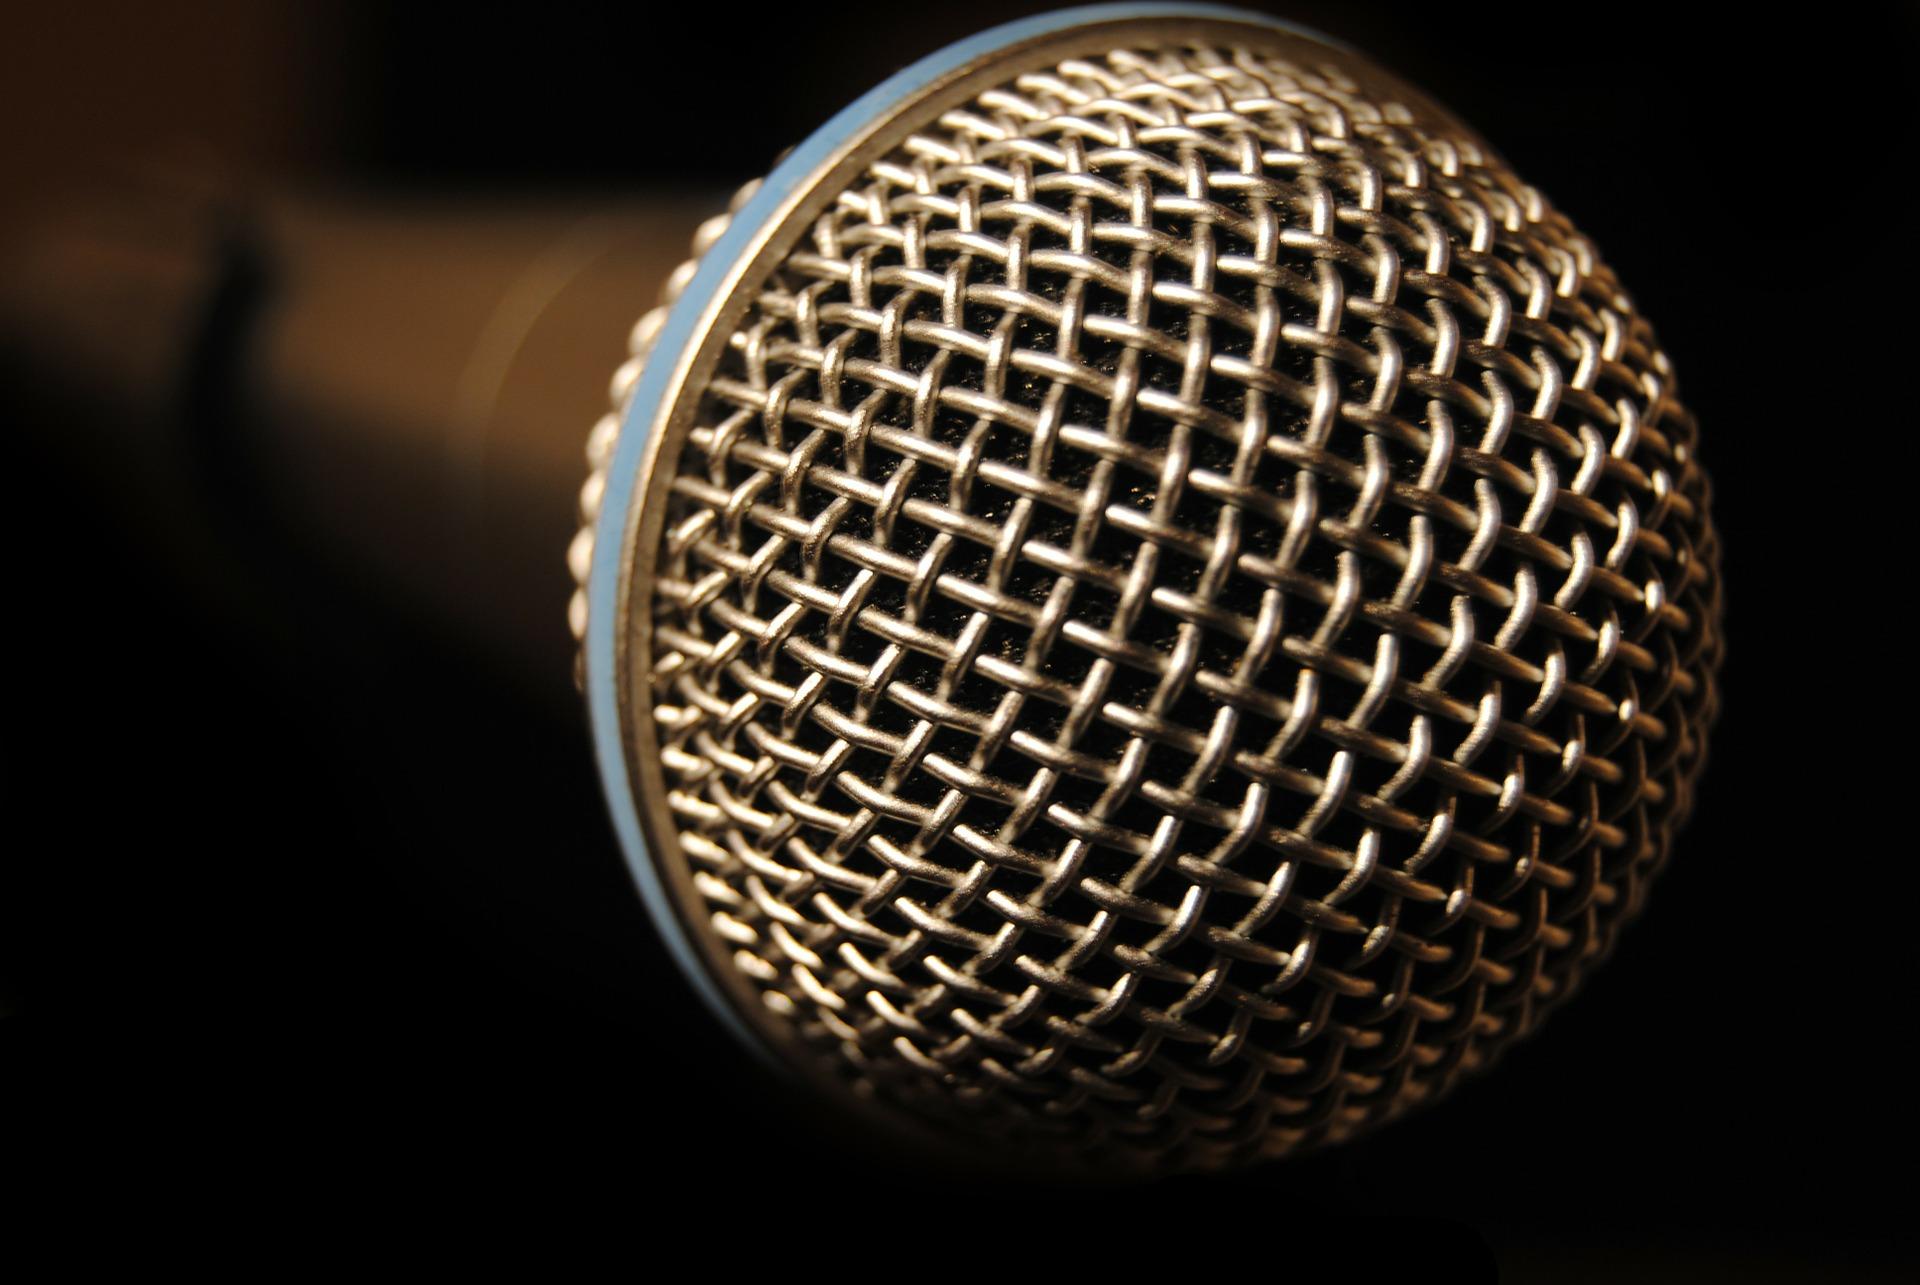 microphone-233717_1920.jpg